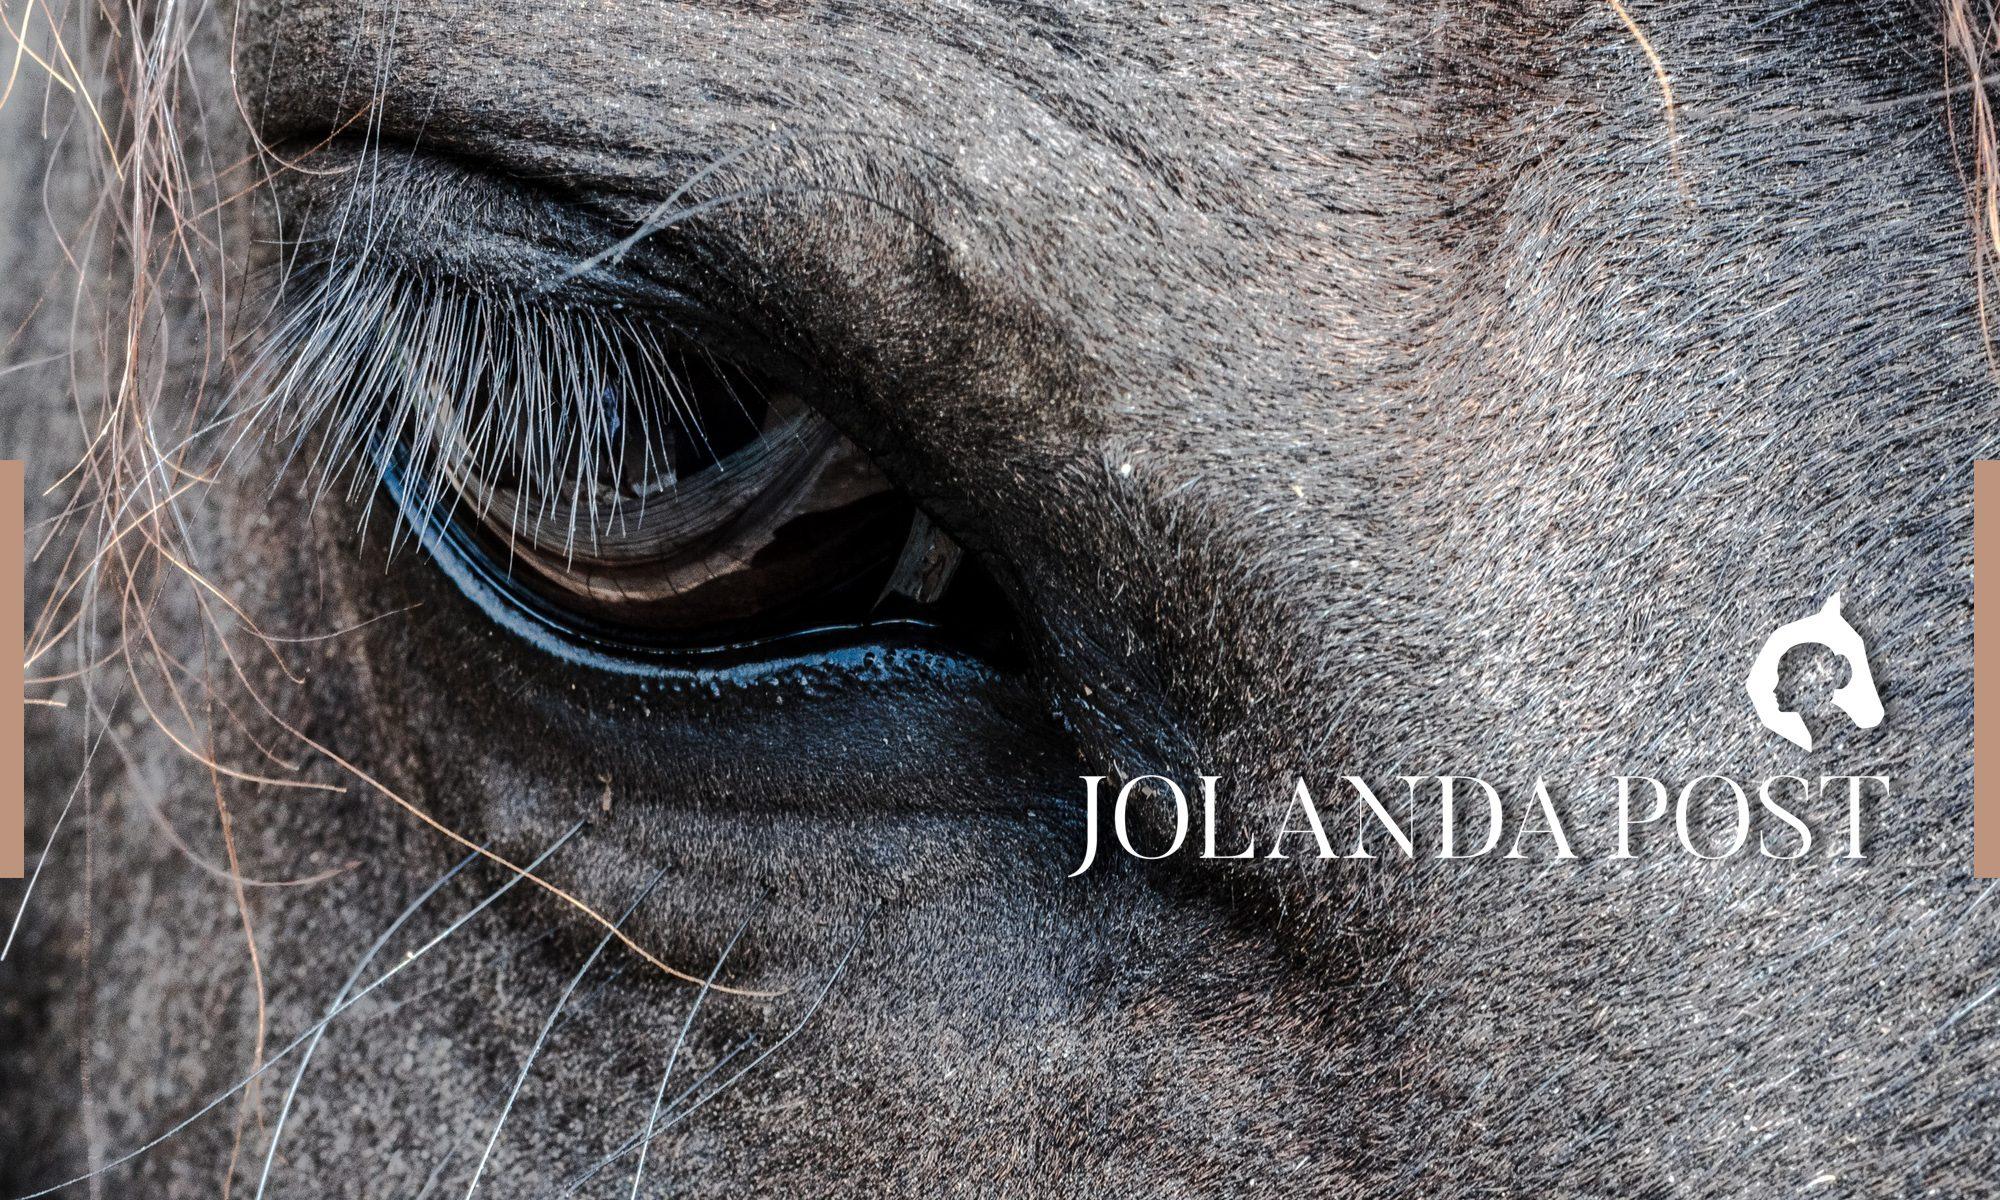 Jolanda Post